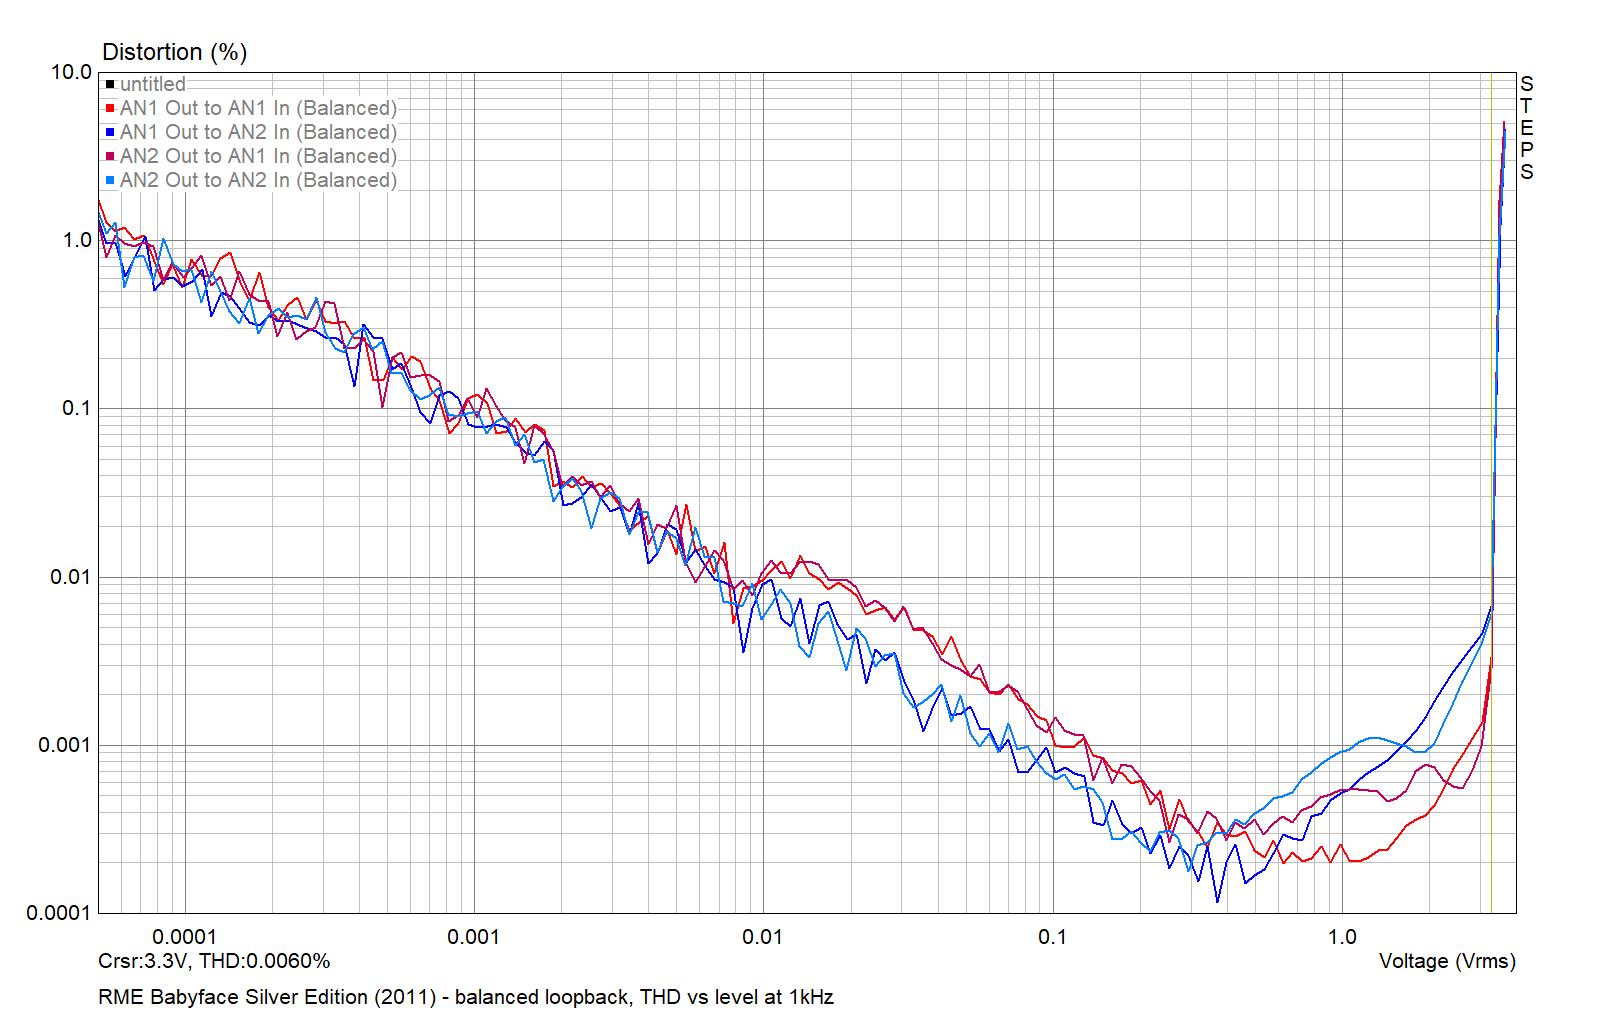 RME Babyface Silver Edition 2011 - AN balanced THD vs level 1kHz 2021-04-01.png